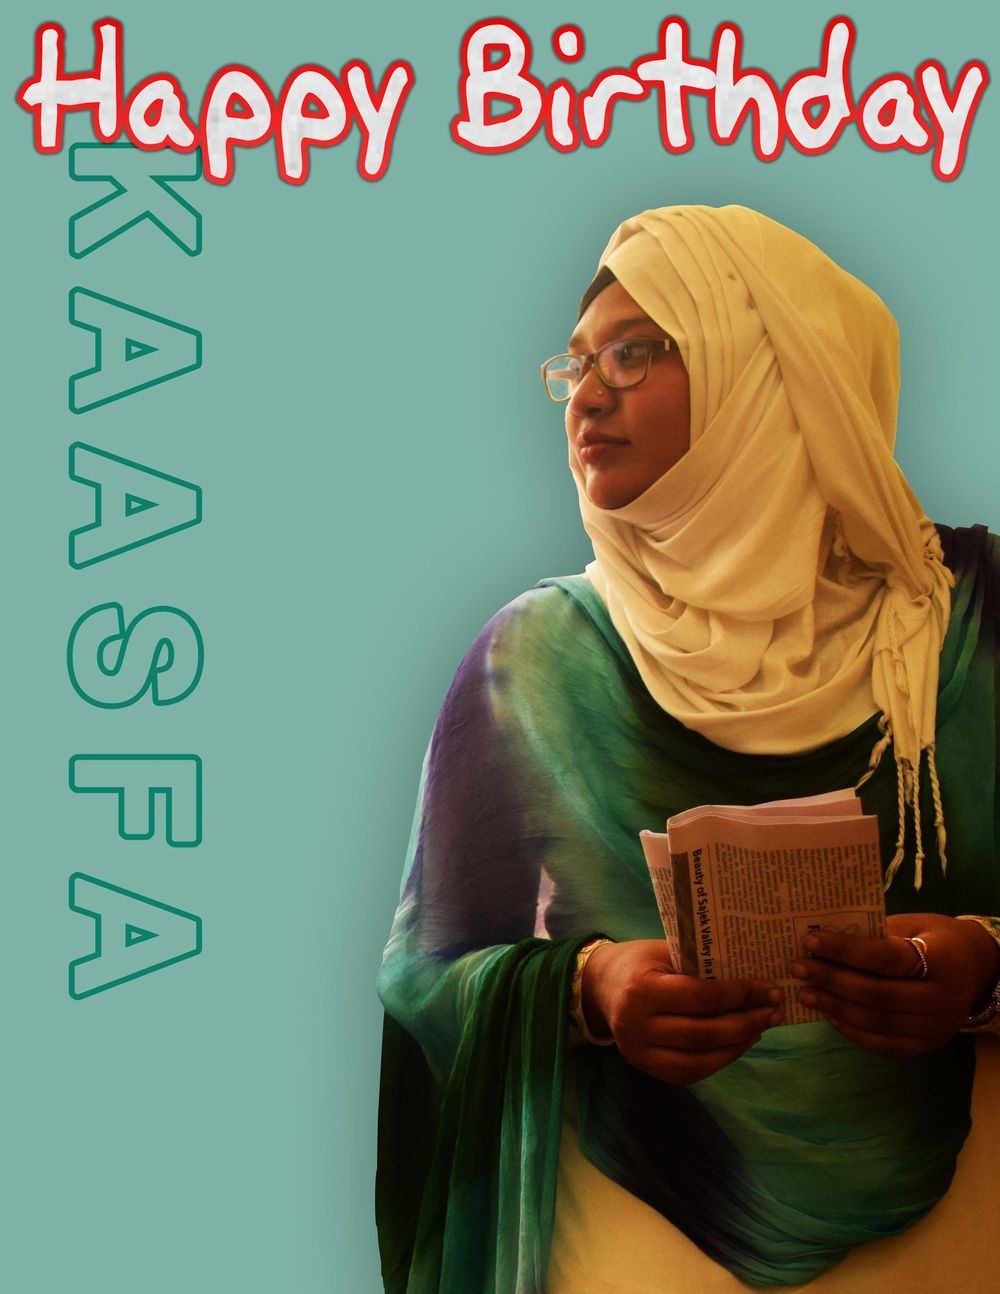 Happy Birthday Aunty - image 1 - student project